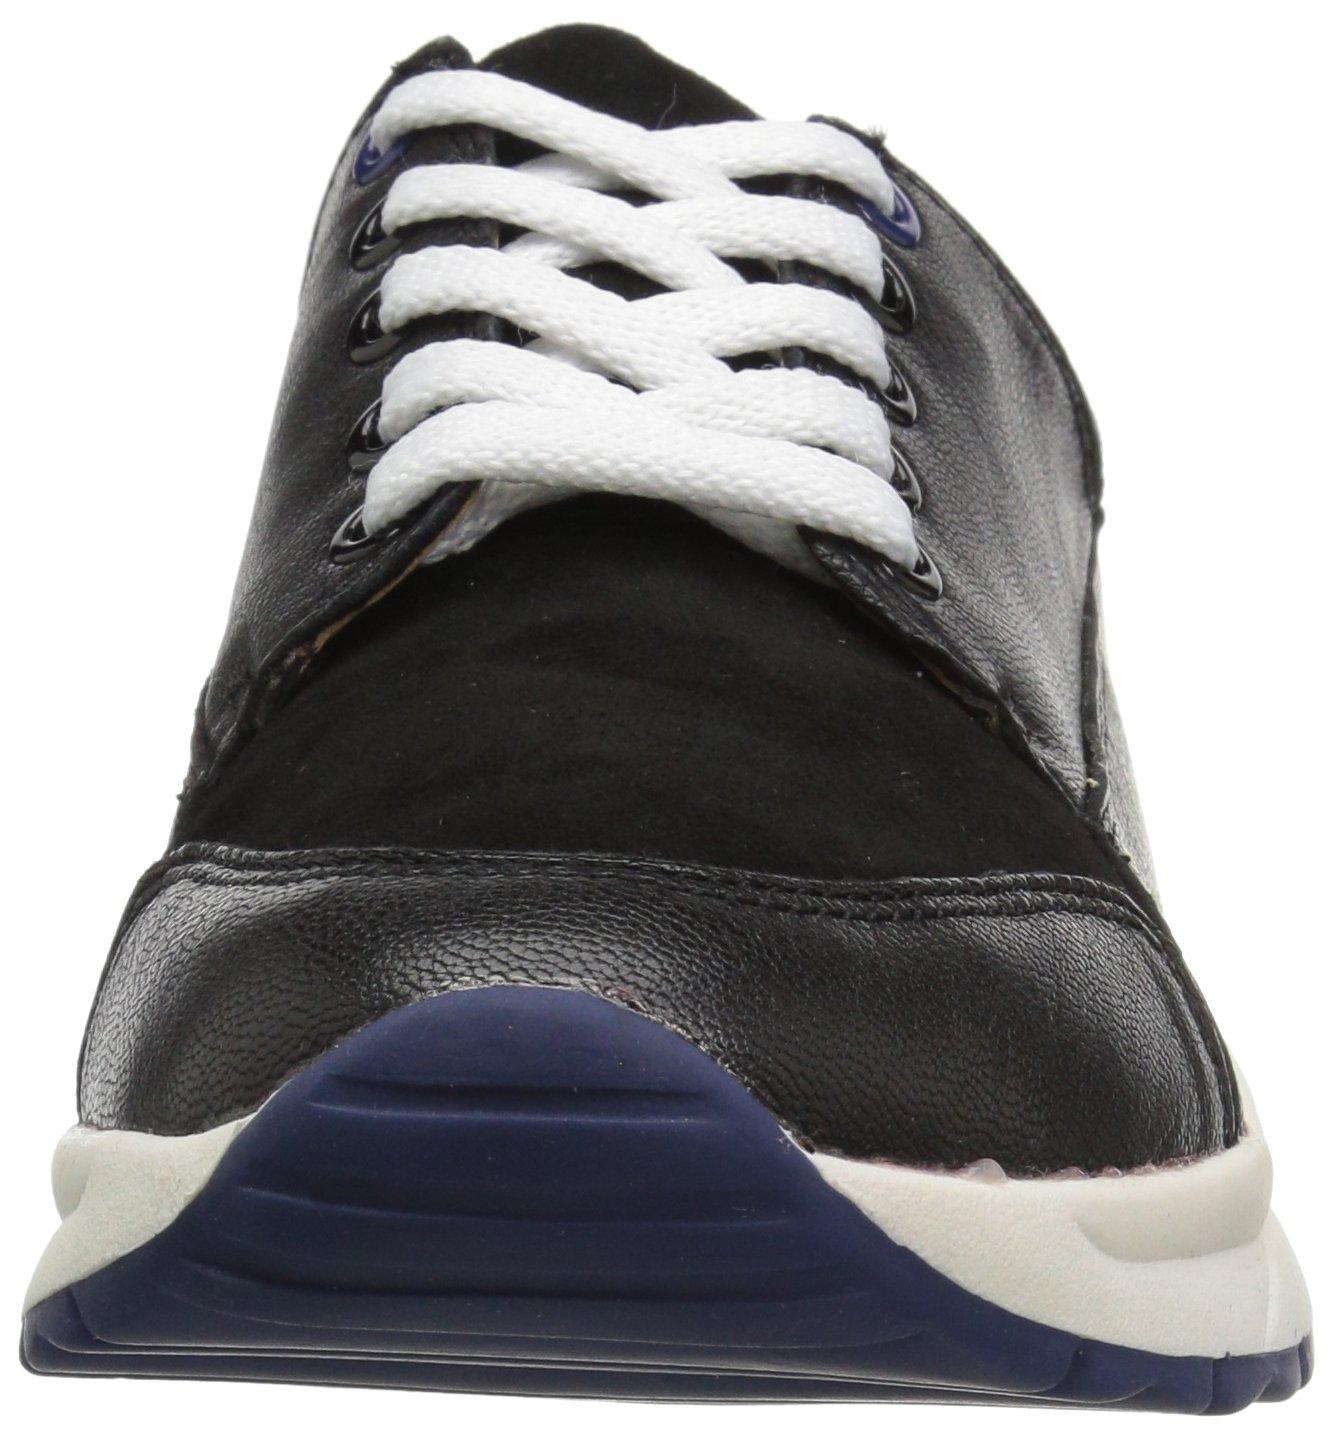 Naturalizer Women's Sabine Sneaker B07579RZMK 7.5 B(M) US|Black